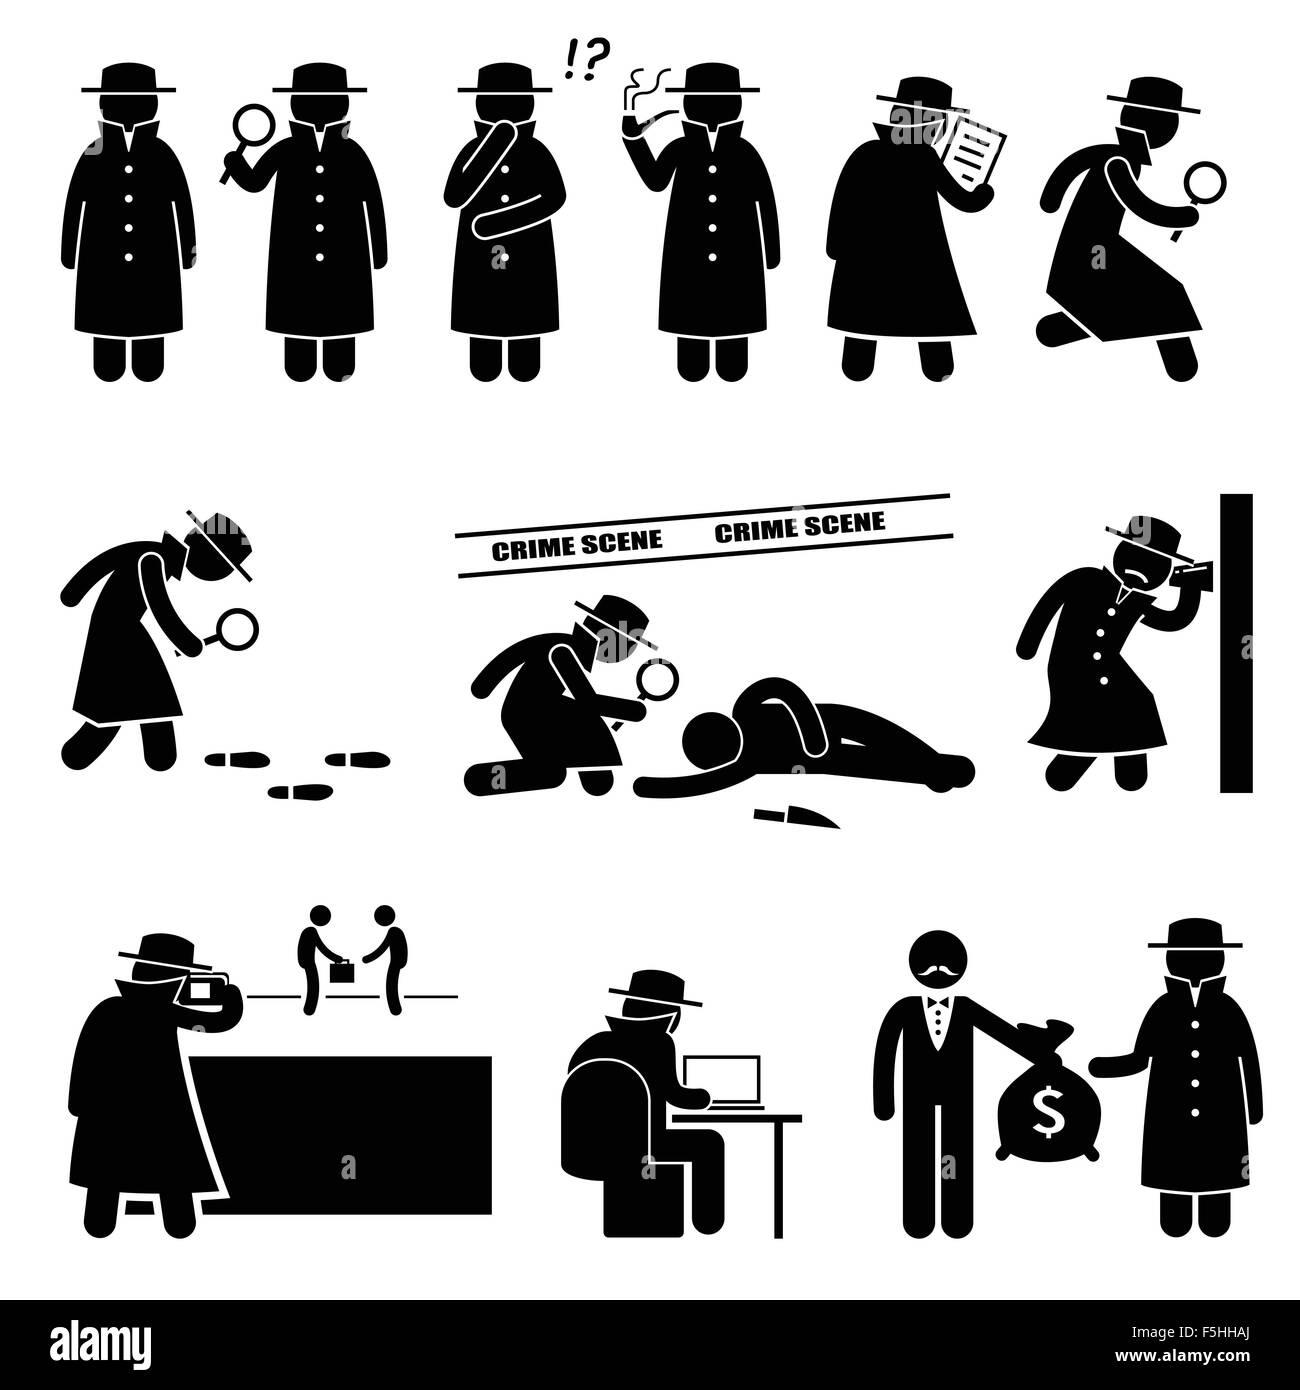 Detective Spy Private Investigator Stick Figure Pictogram Icons - Stock Vector